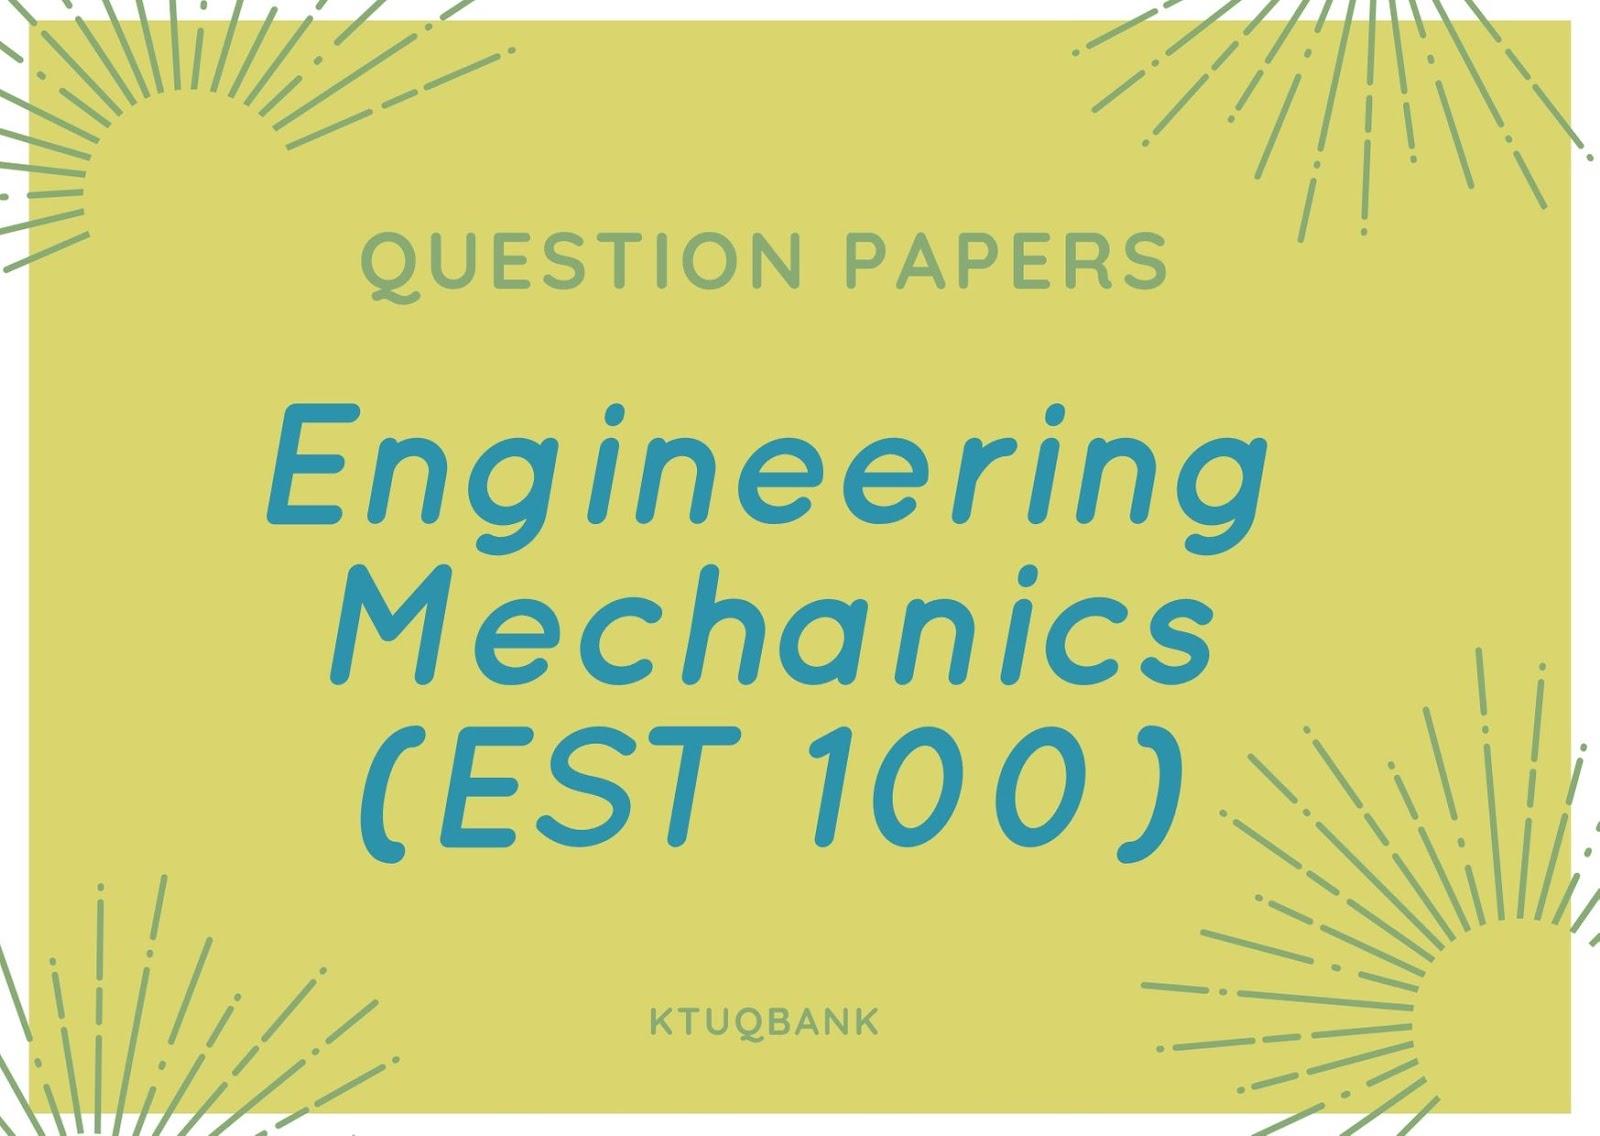 Engineering Mechanics | EST100 | Question Papers